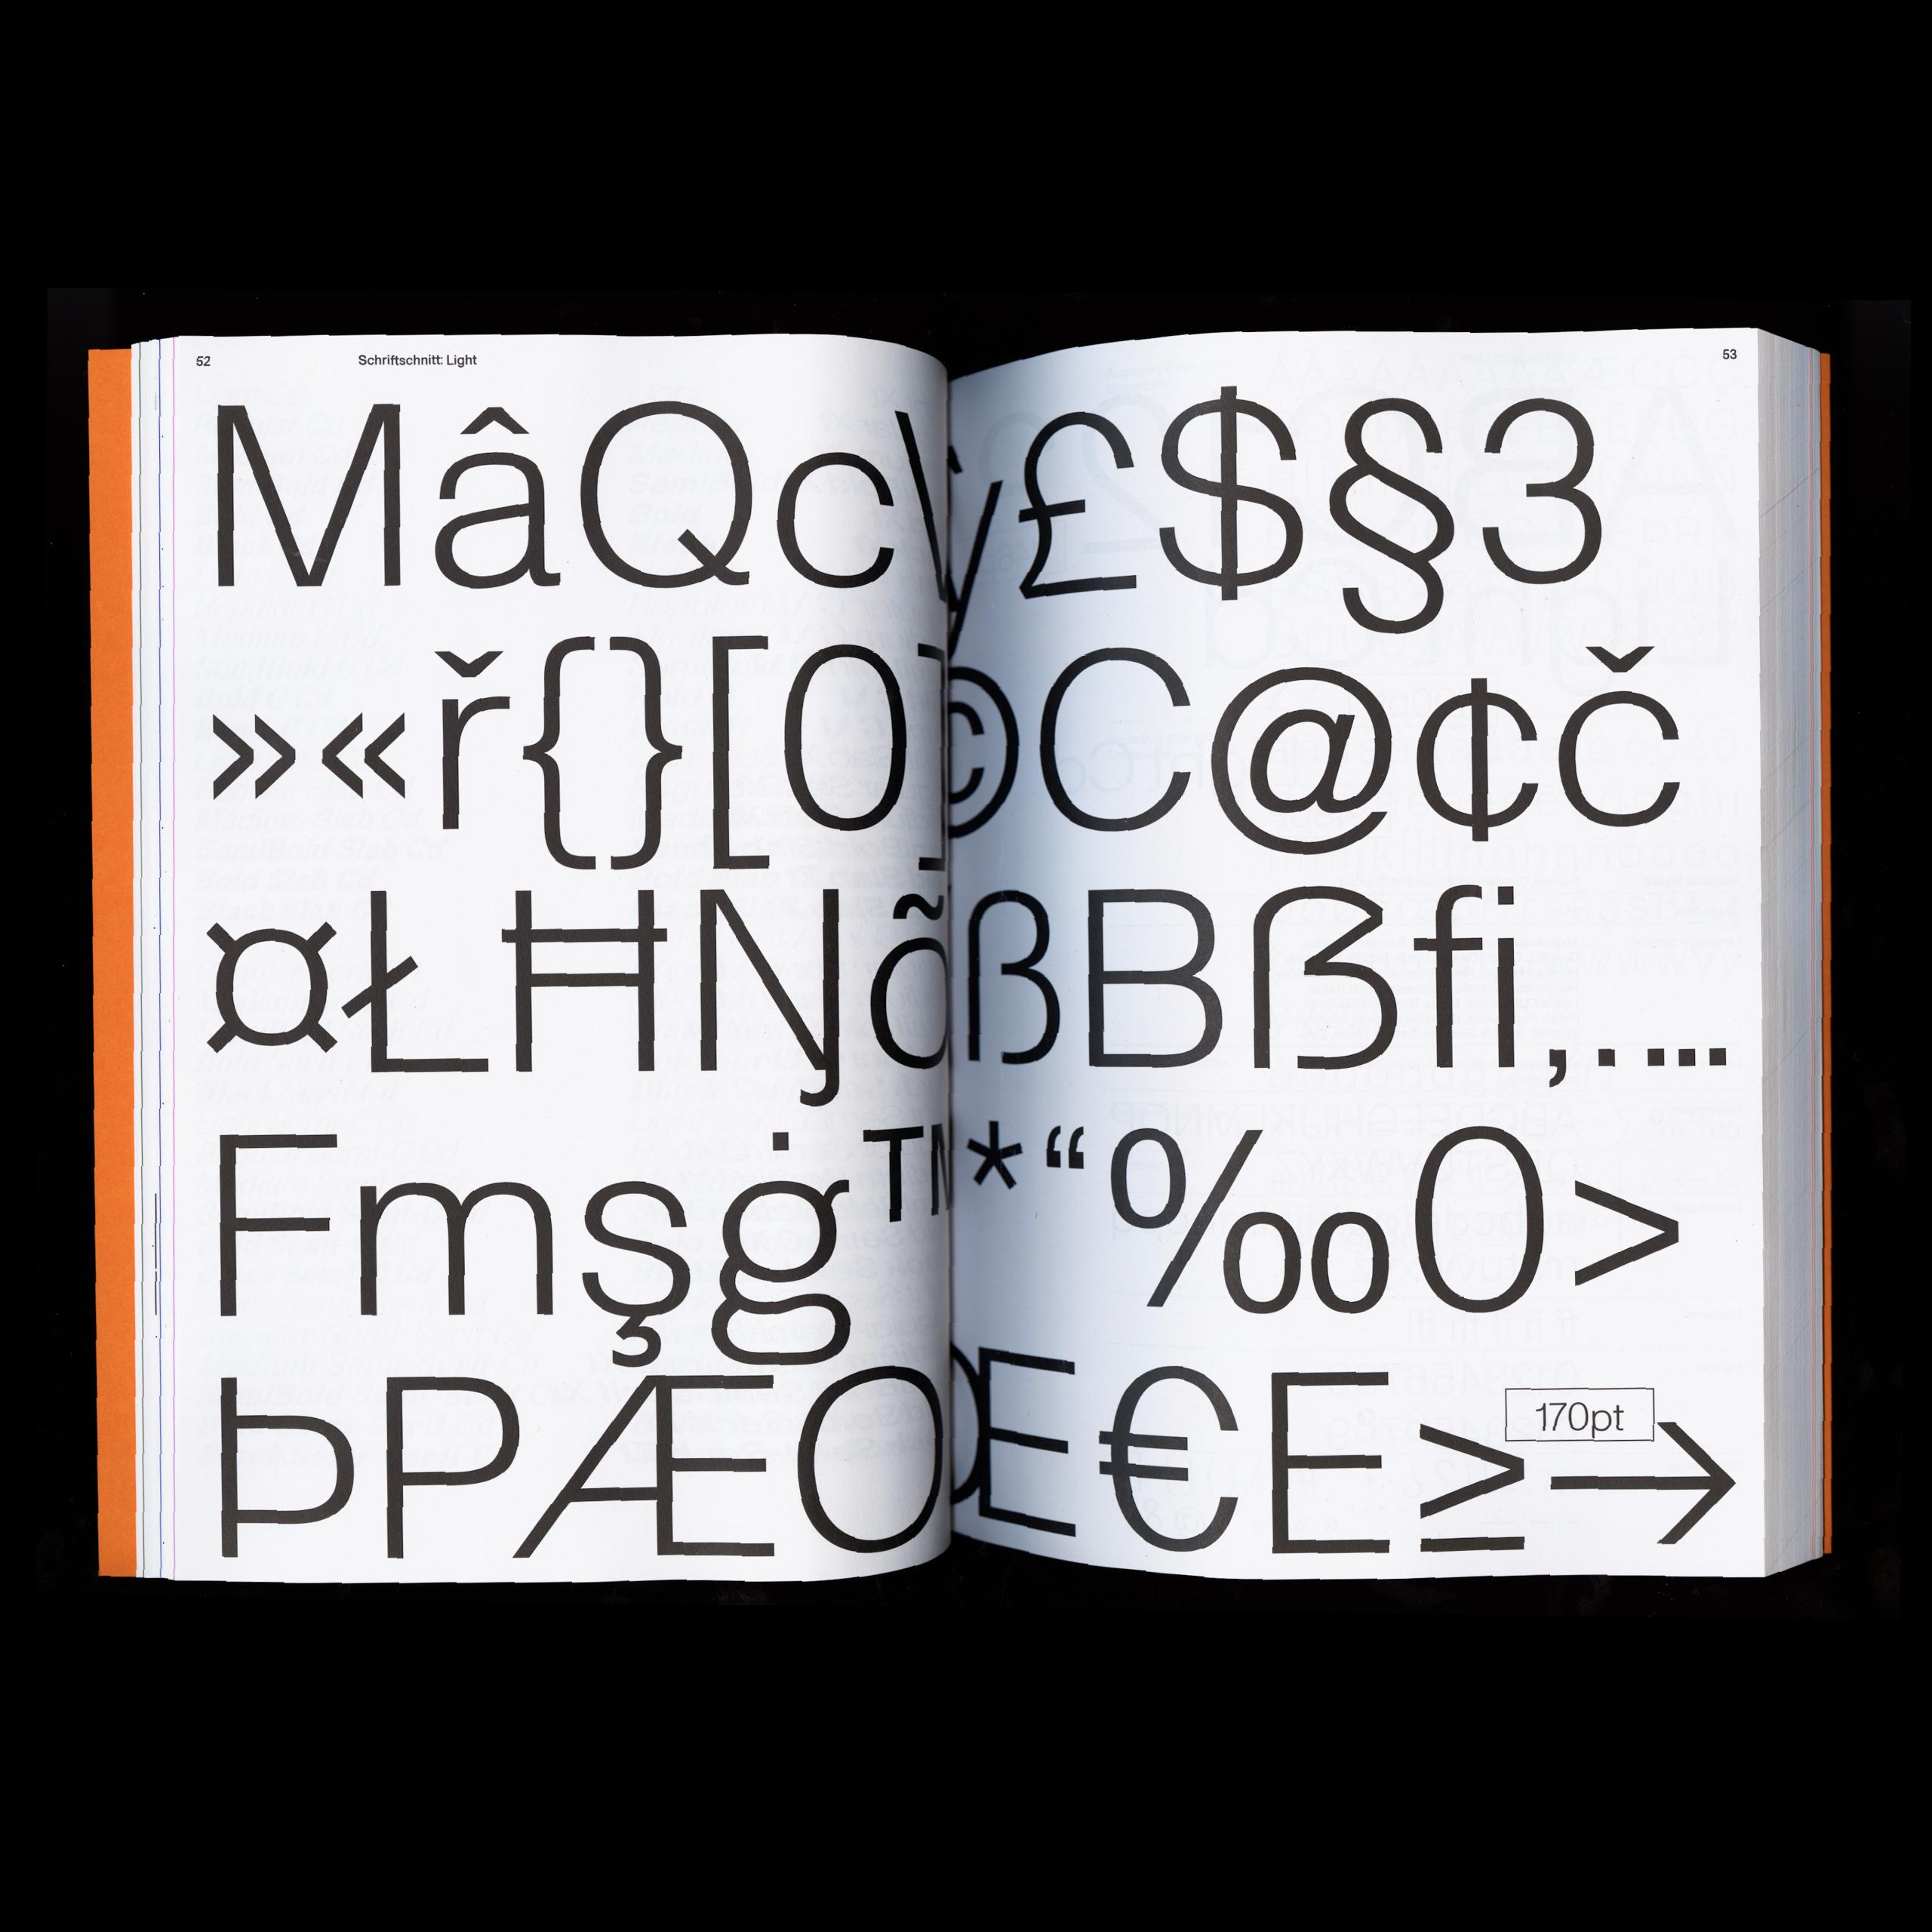 Daniel_Stuhlpfarrer_Spekulative-Schriftgestaltung-Speculative-Type-Design_WEB73